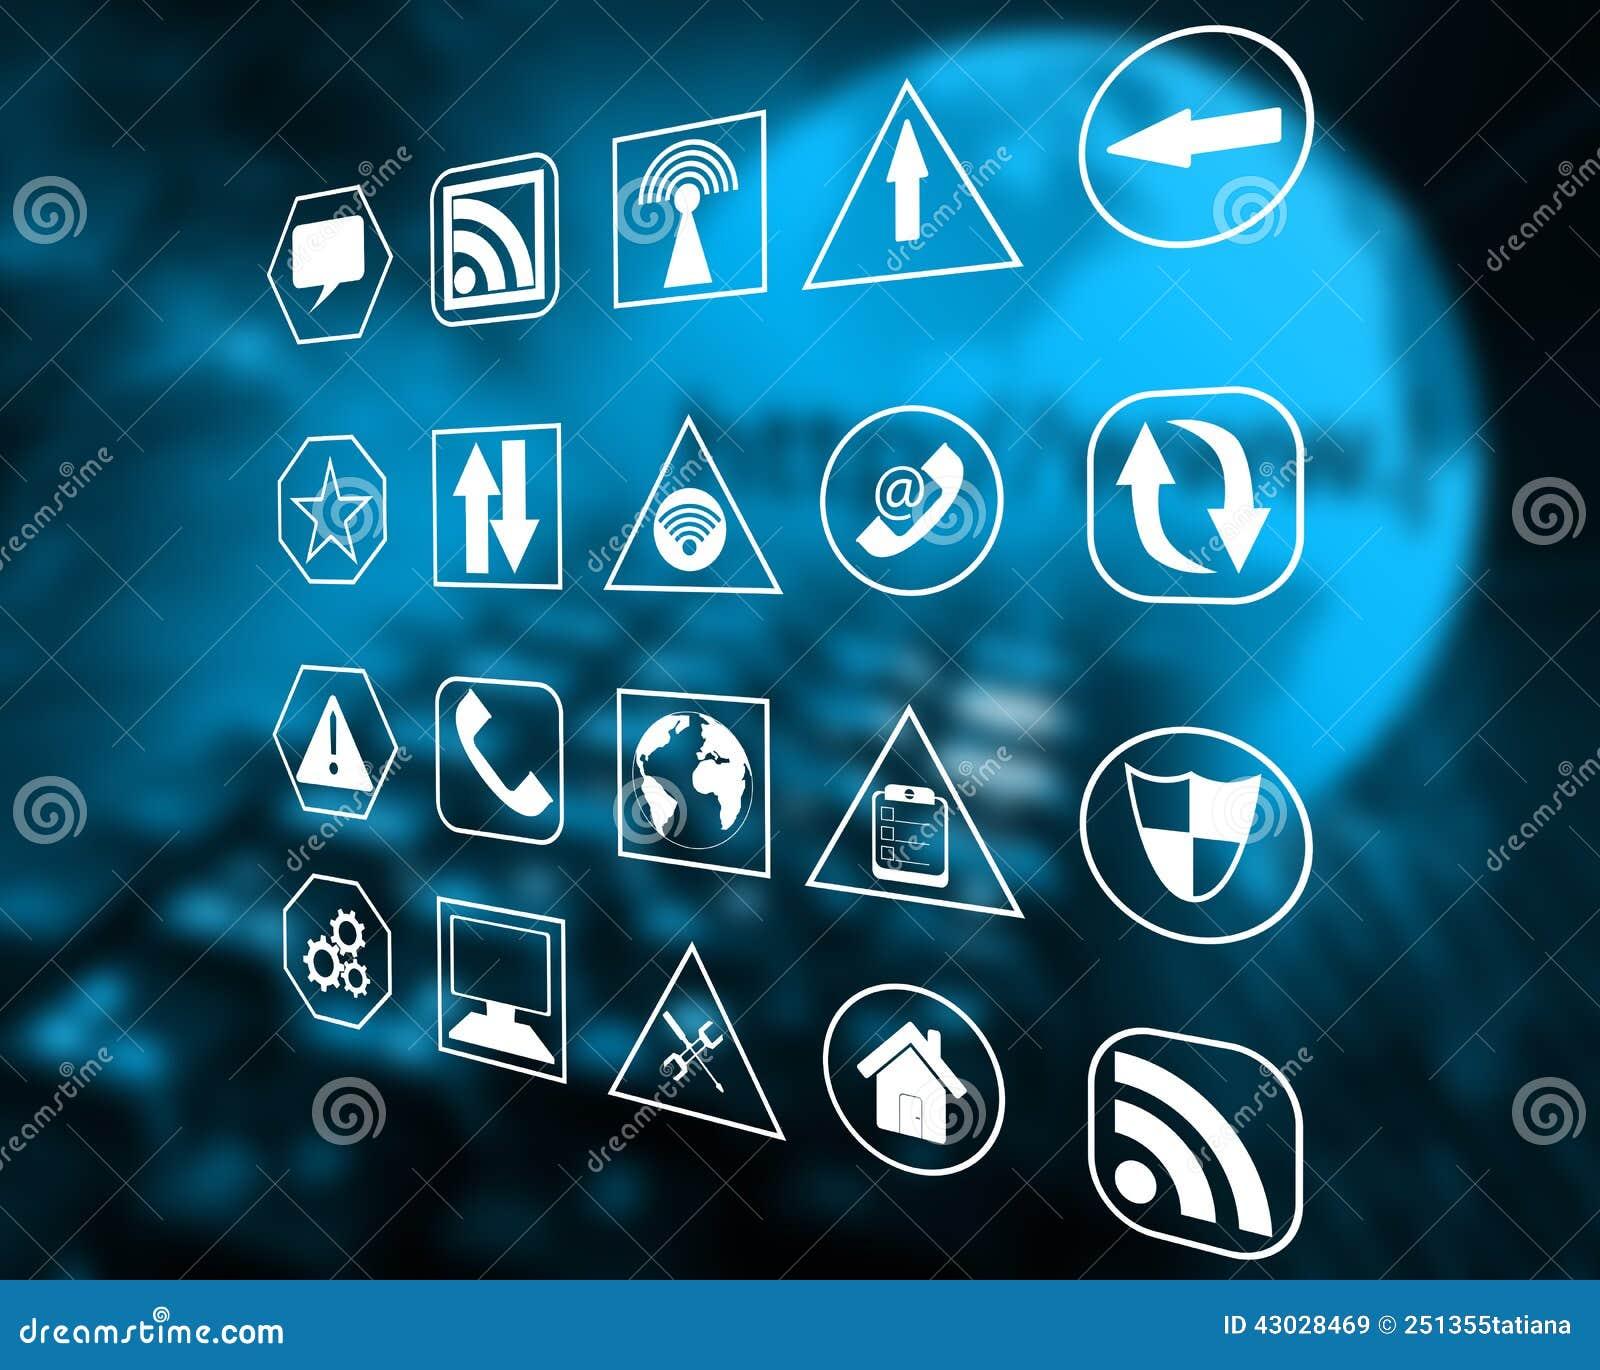 Icons Interface Stock Illustration Illustration Of Definition